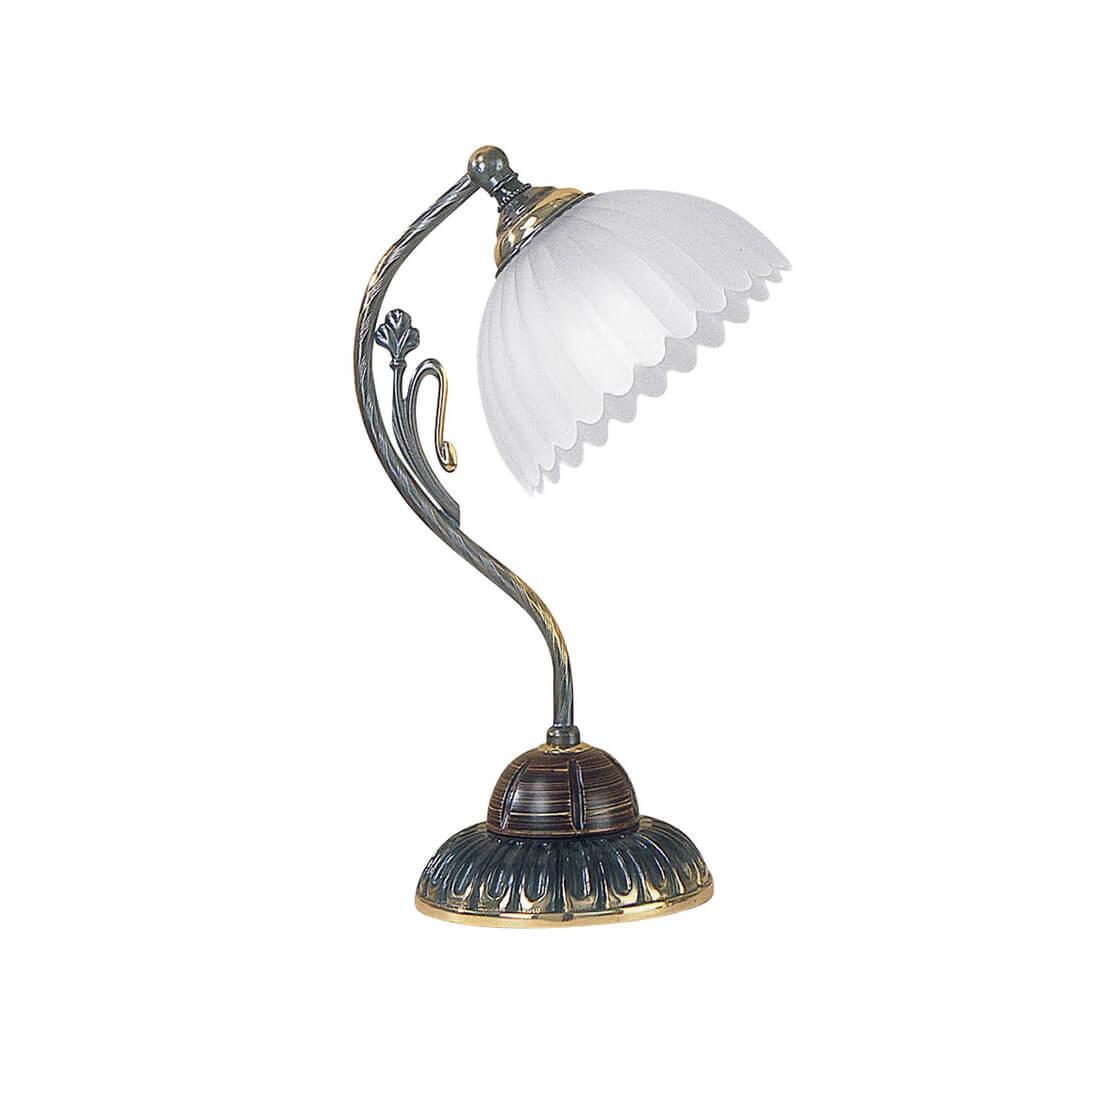 Фото Настольная лампа декоративная Reccagni Angelo 2805 P 1805